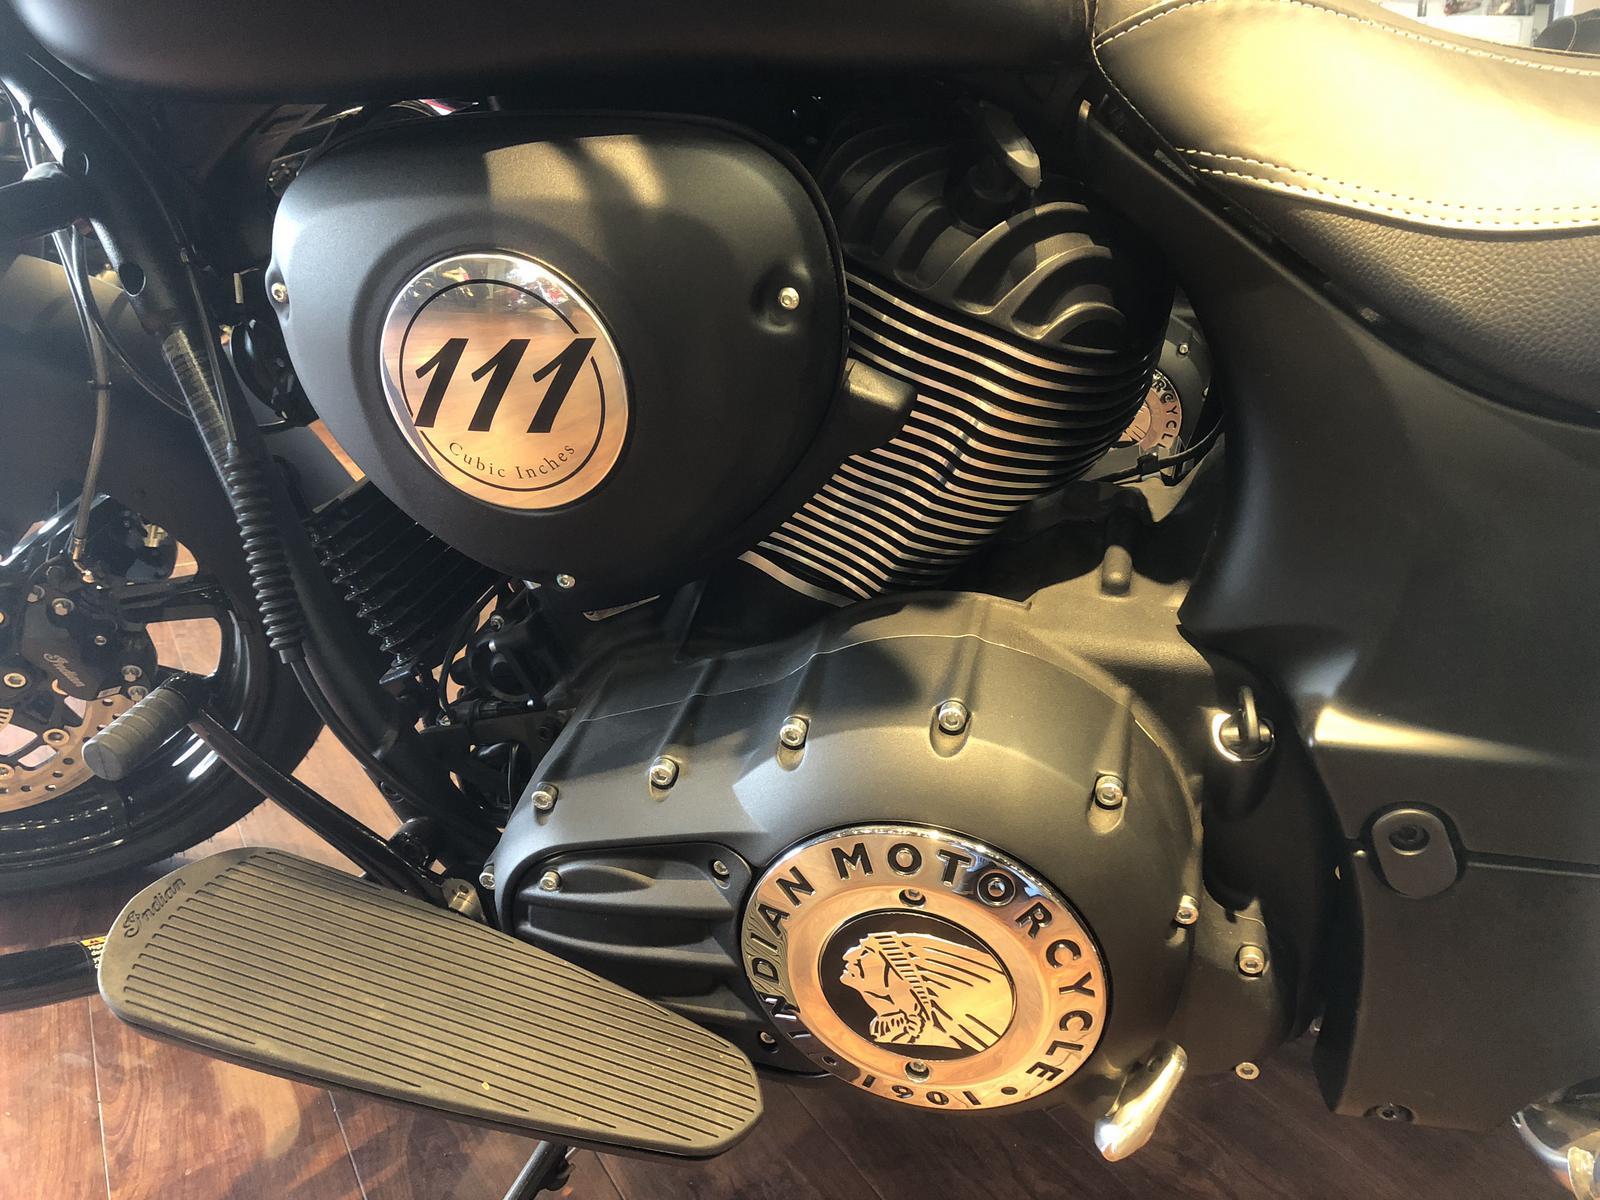 2018 Indian Motorcycle Chieftain Dark Horse - Demonstrator Model